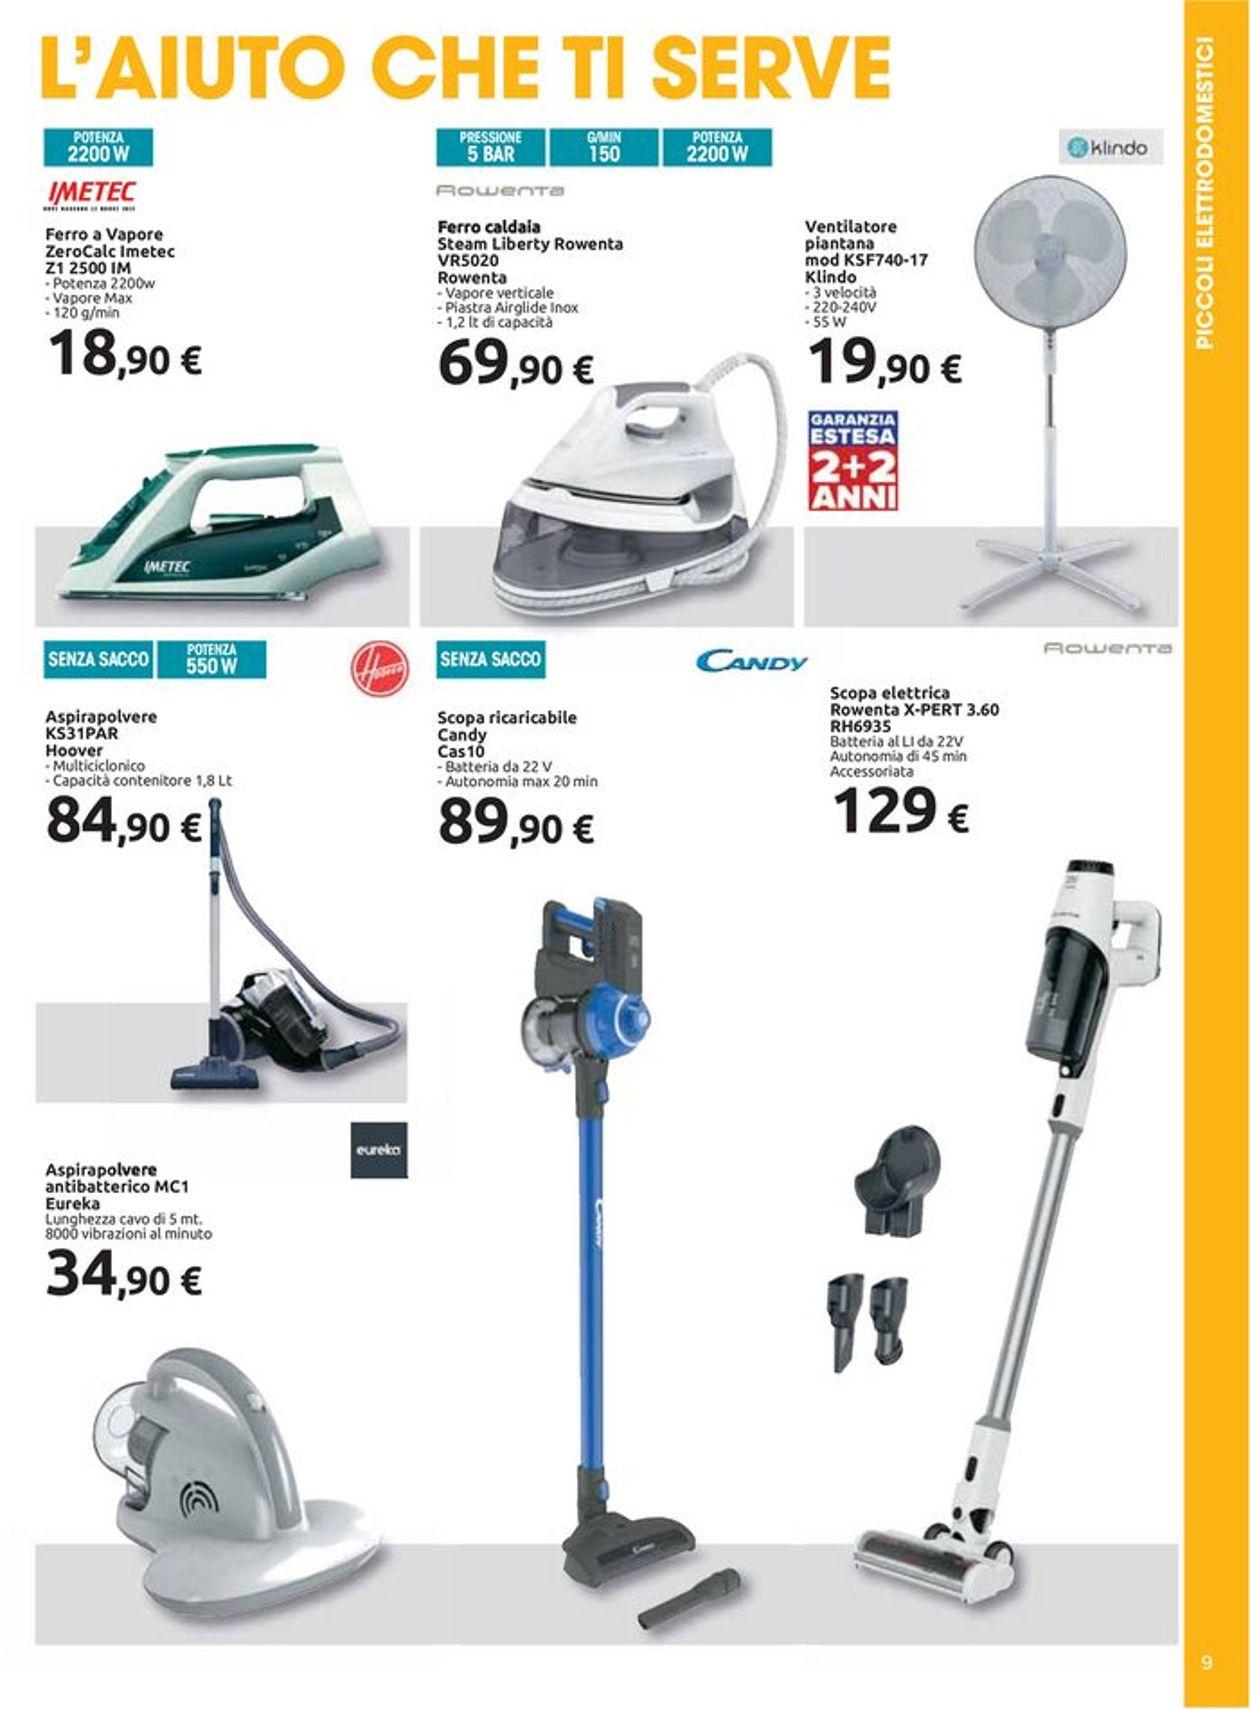 Volantino Carrefour - Offerte 31/05-01/08/2021 (Pagina 9)